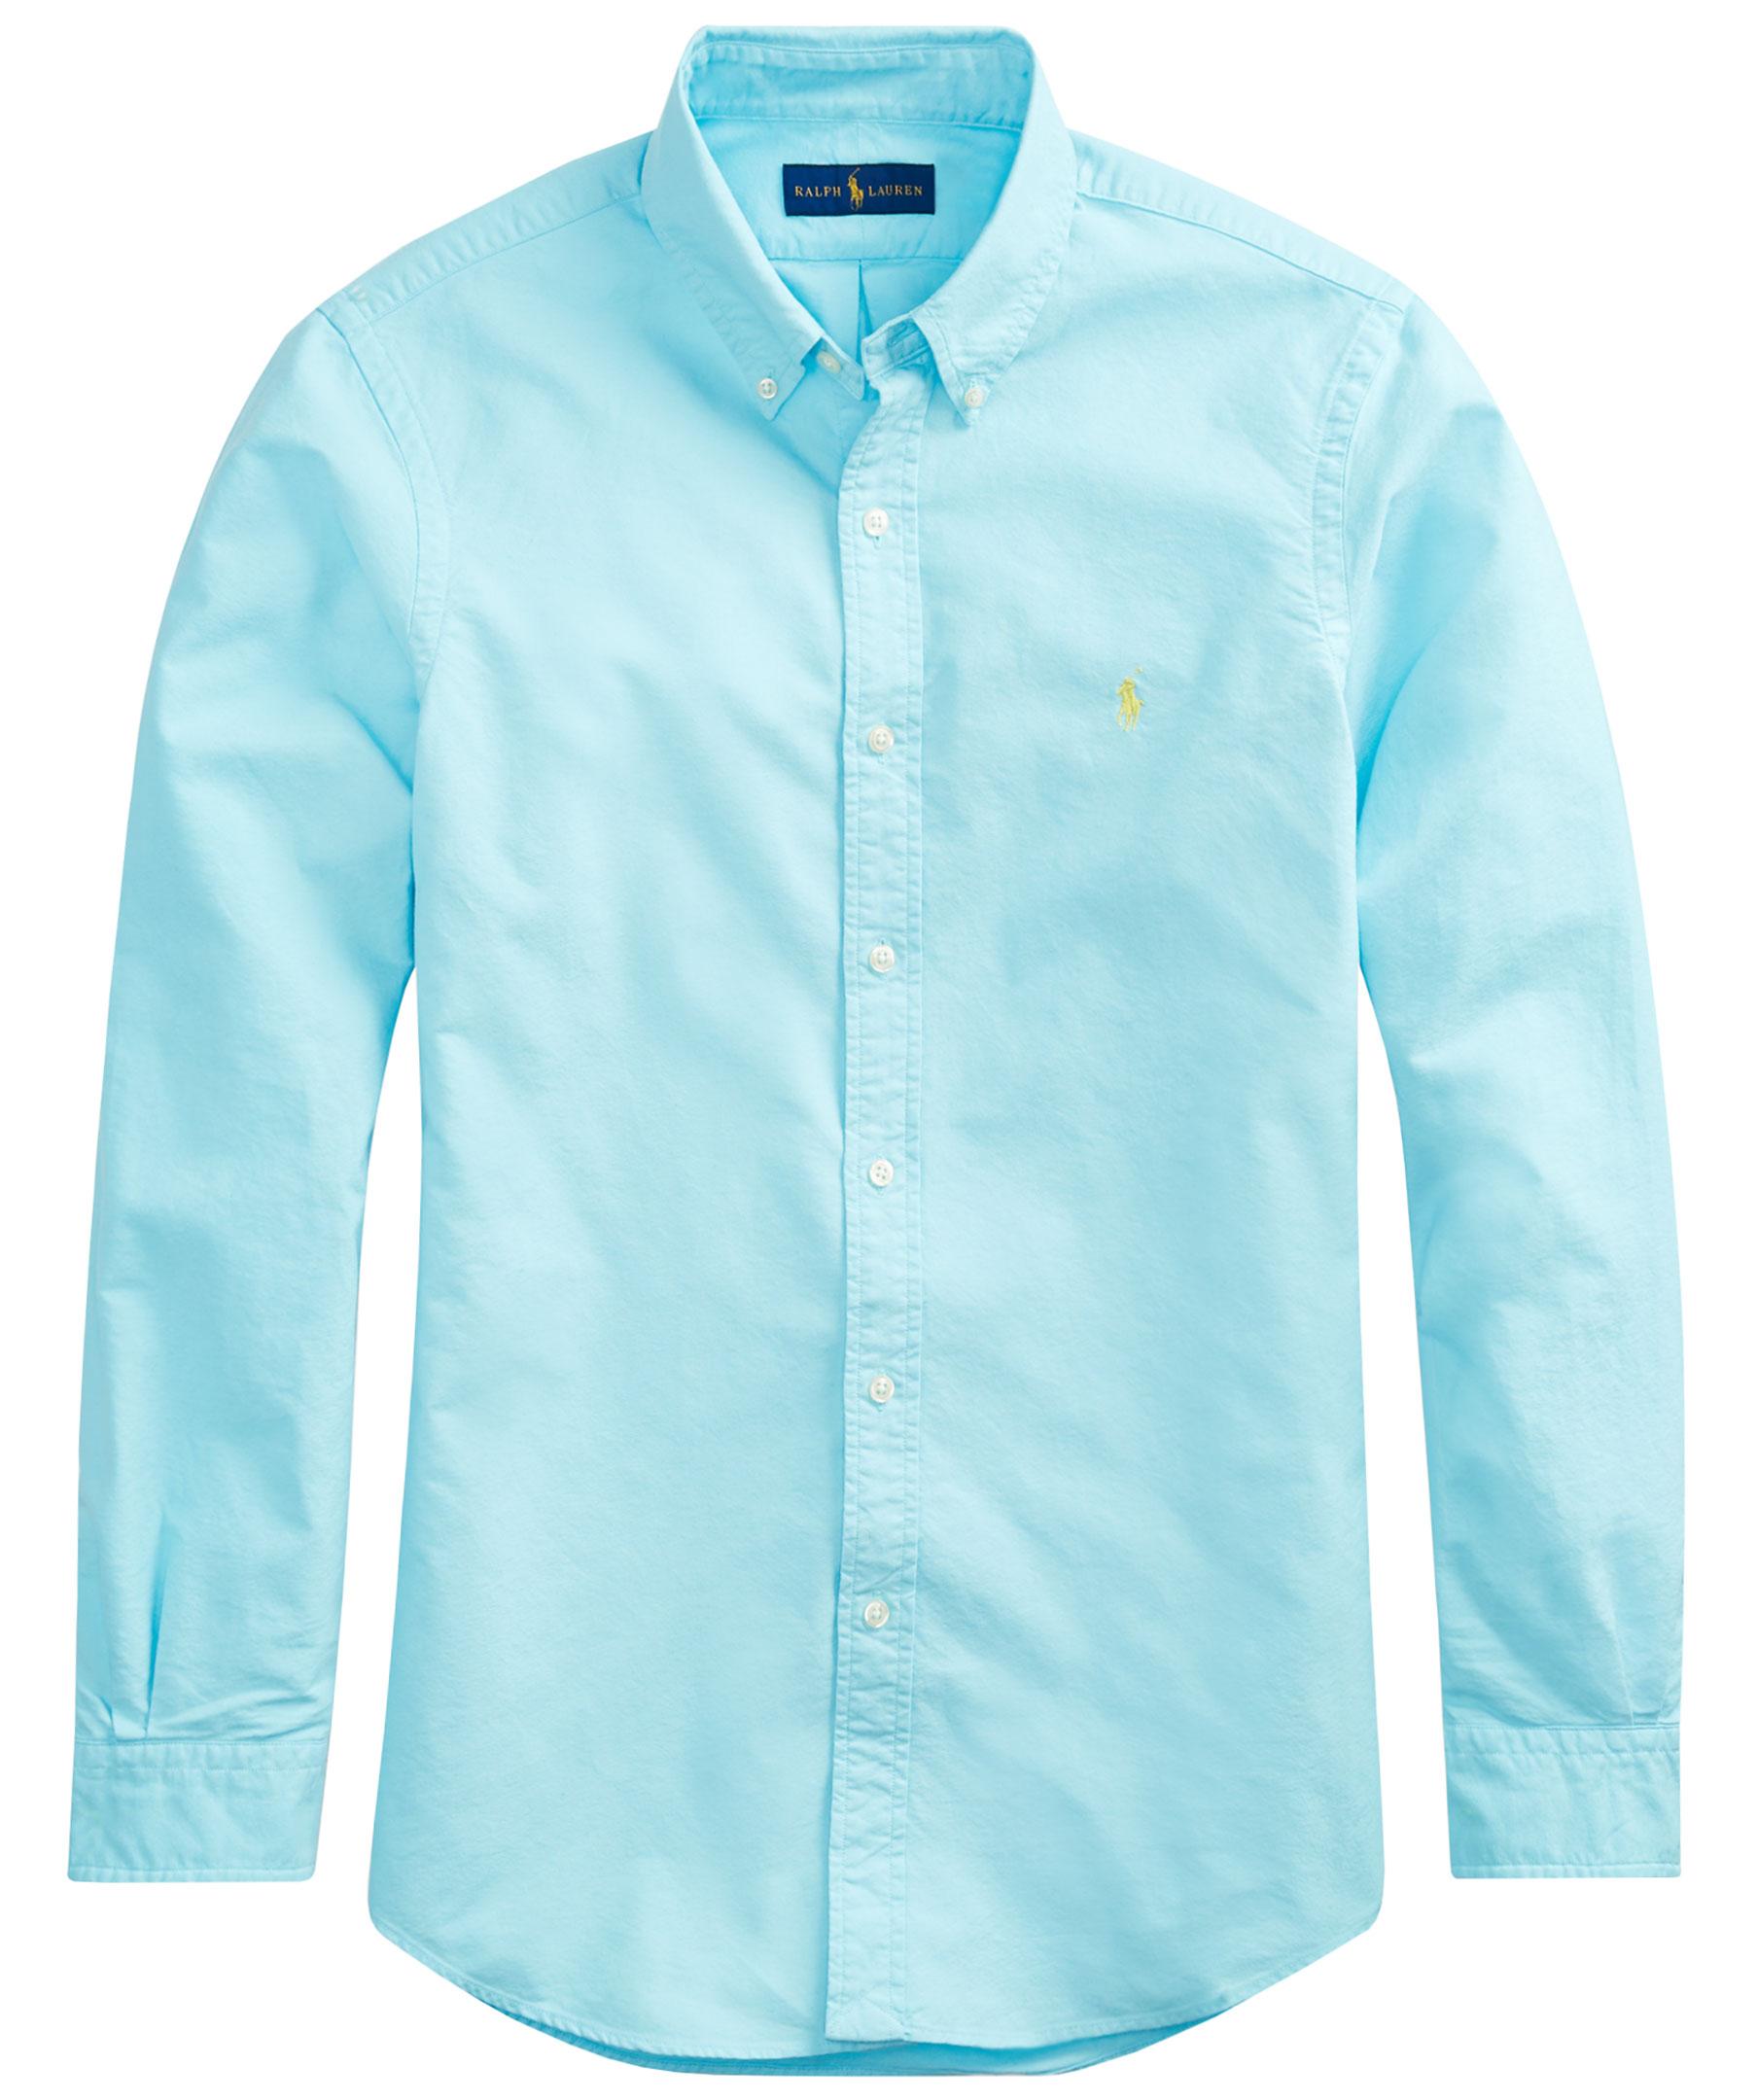 ebdbc7822 Handla Polo Ralph Lauren Garment dyed oxford slim hos Johnells.se